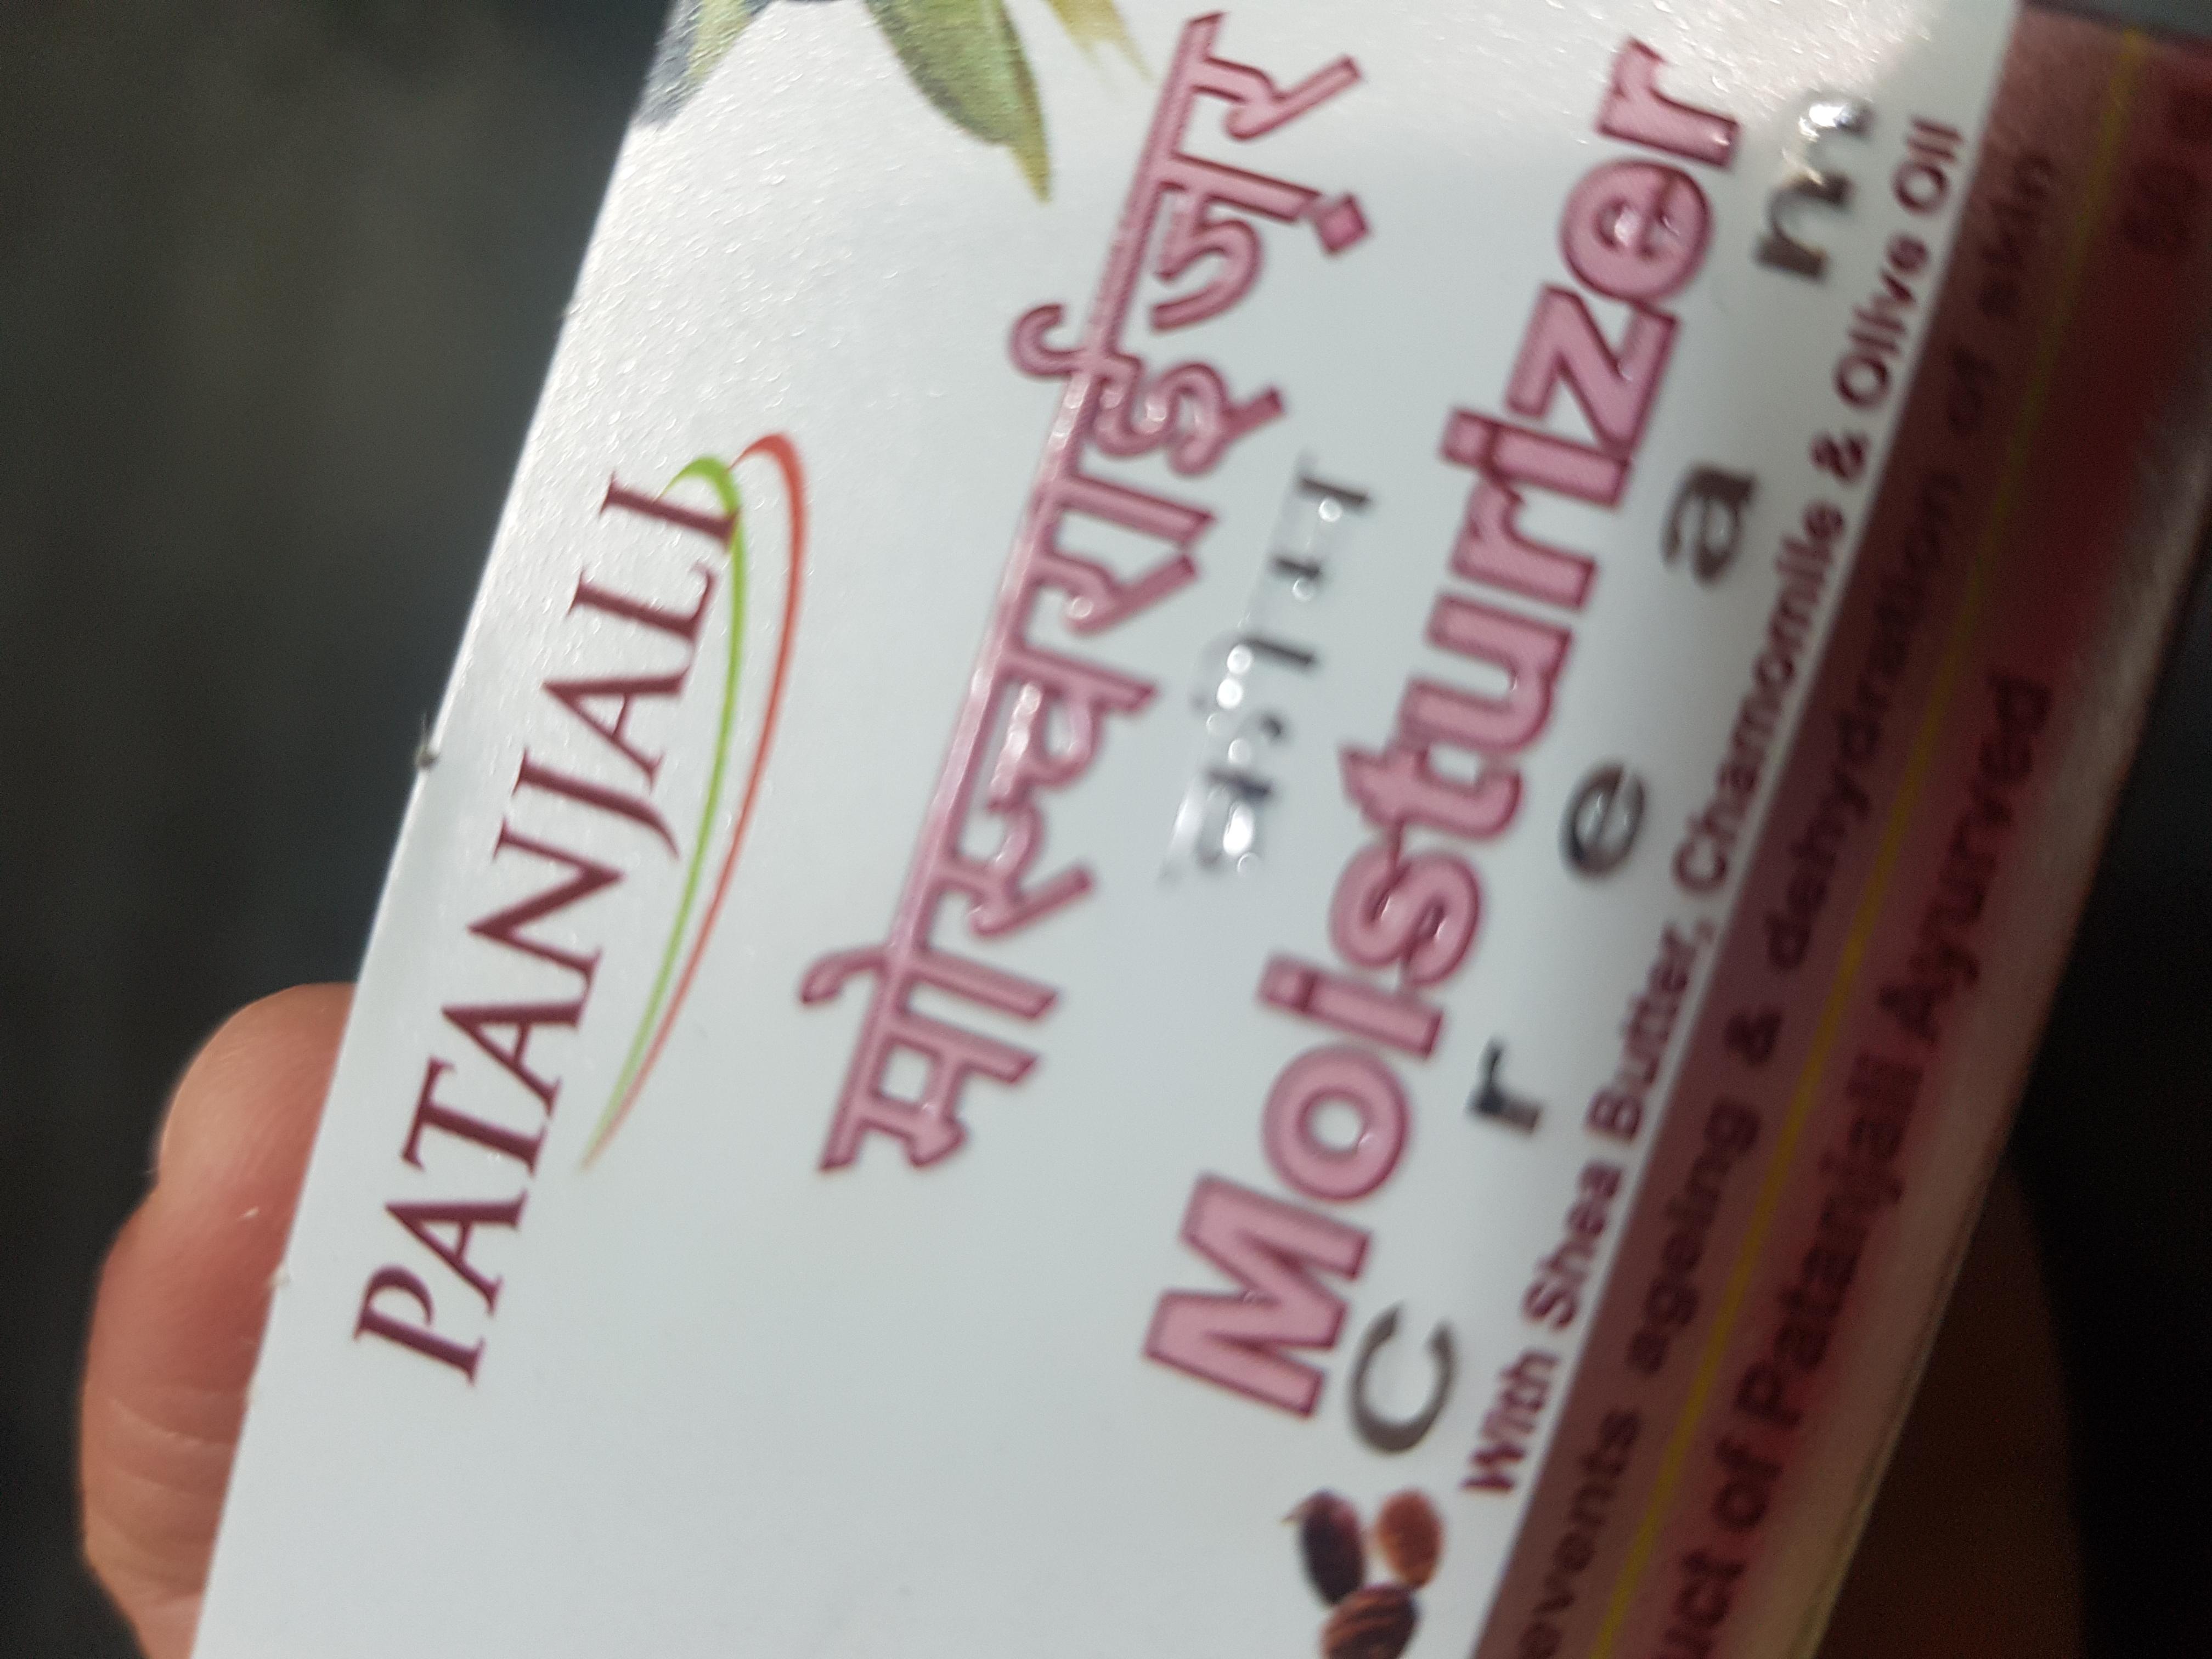 Patanjali Ayurvedic Moisturiser Cream-Non greasy!-By poonam_kakkar